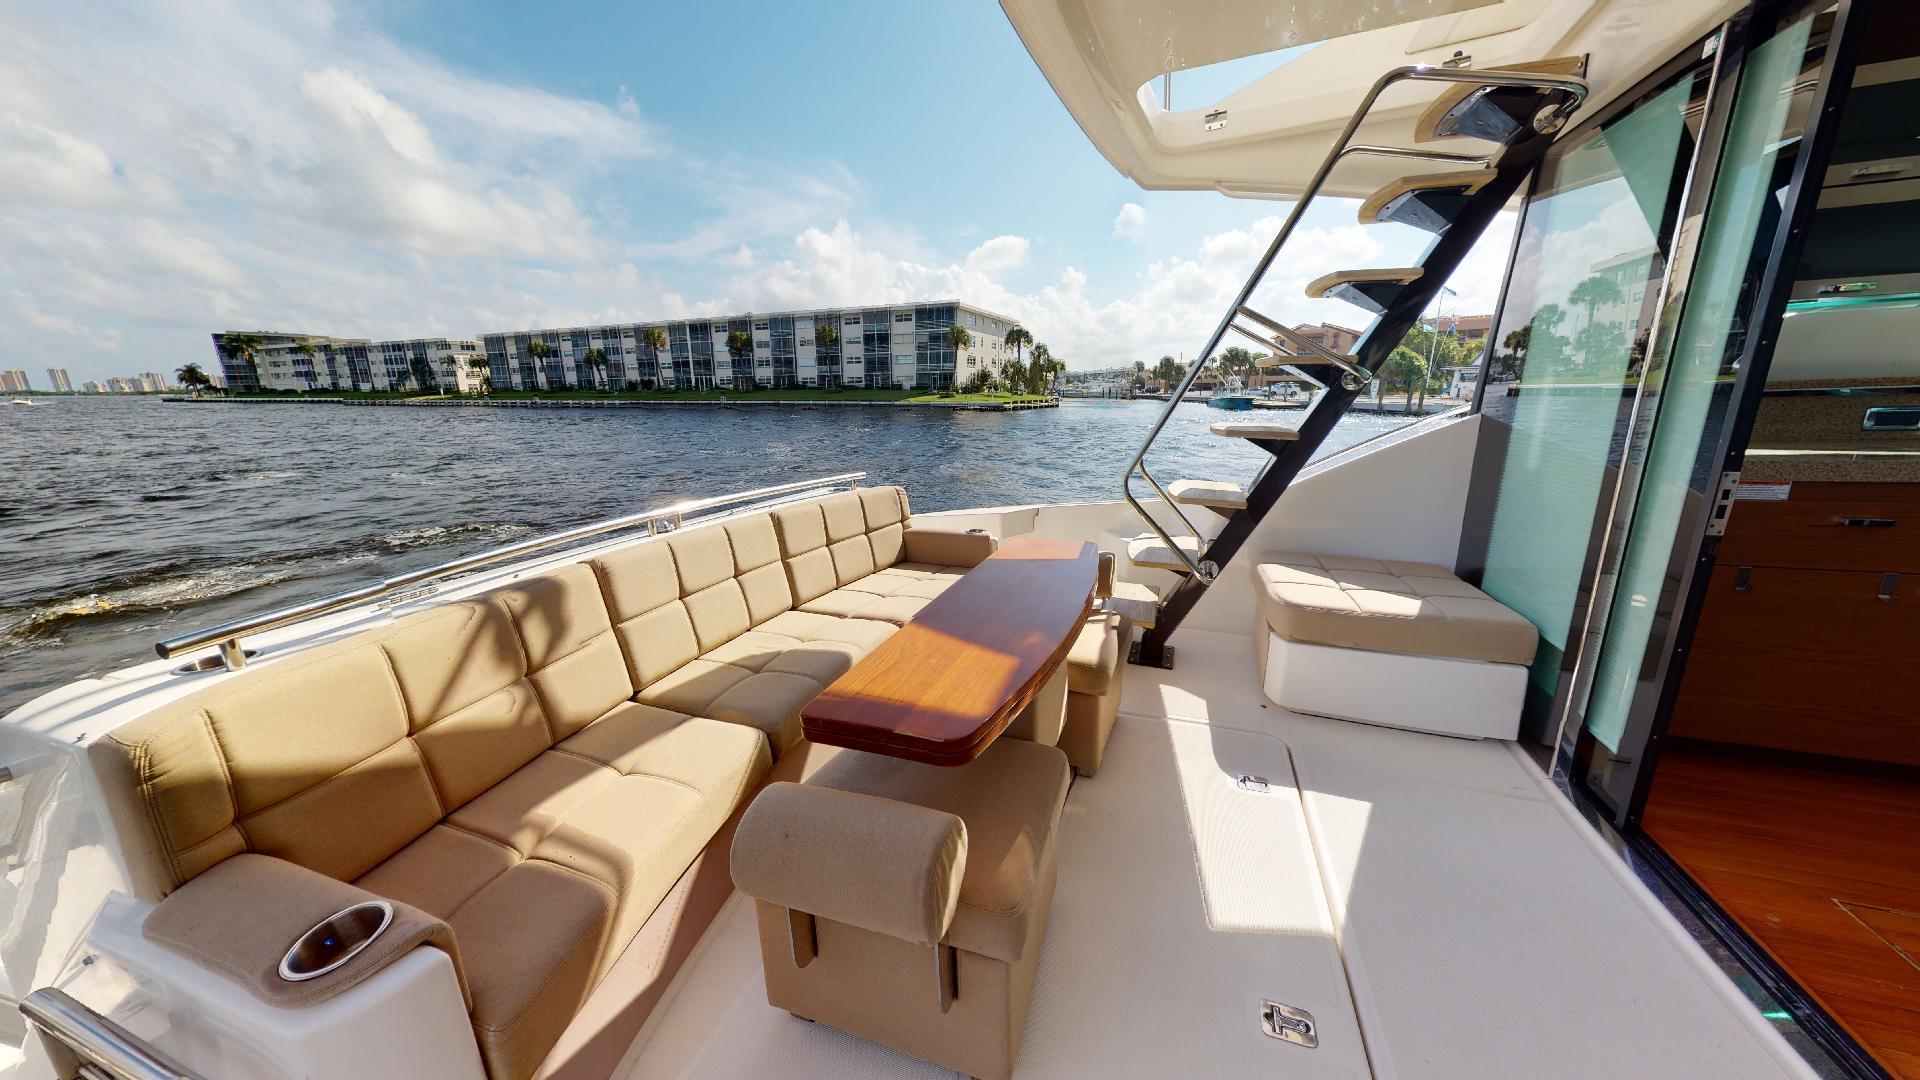 Tiara Yachts-50 Flybridge 2015-Khatch You Later North Palm Beach-Florida-United States-Aft Deck-1509440 | Thumbnail